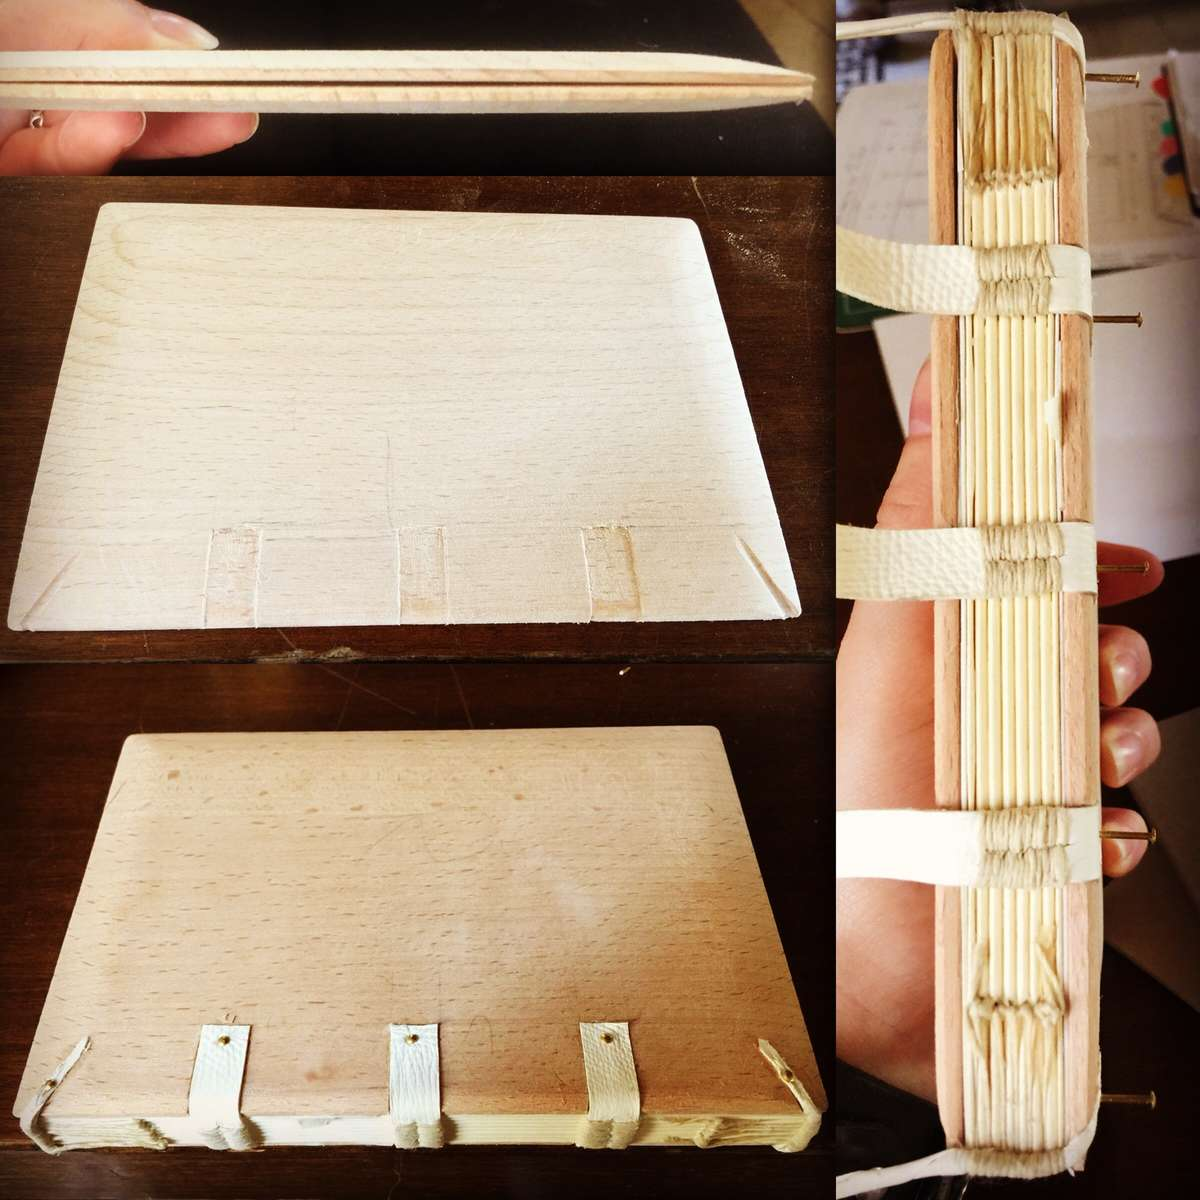 Attaching 15th Century Italian binding textblock to shaped wooden covers. Image: Lucilla Ronai.